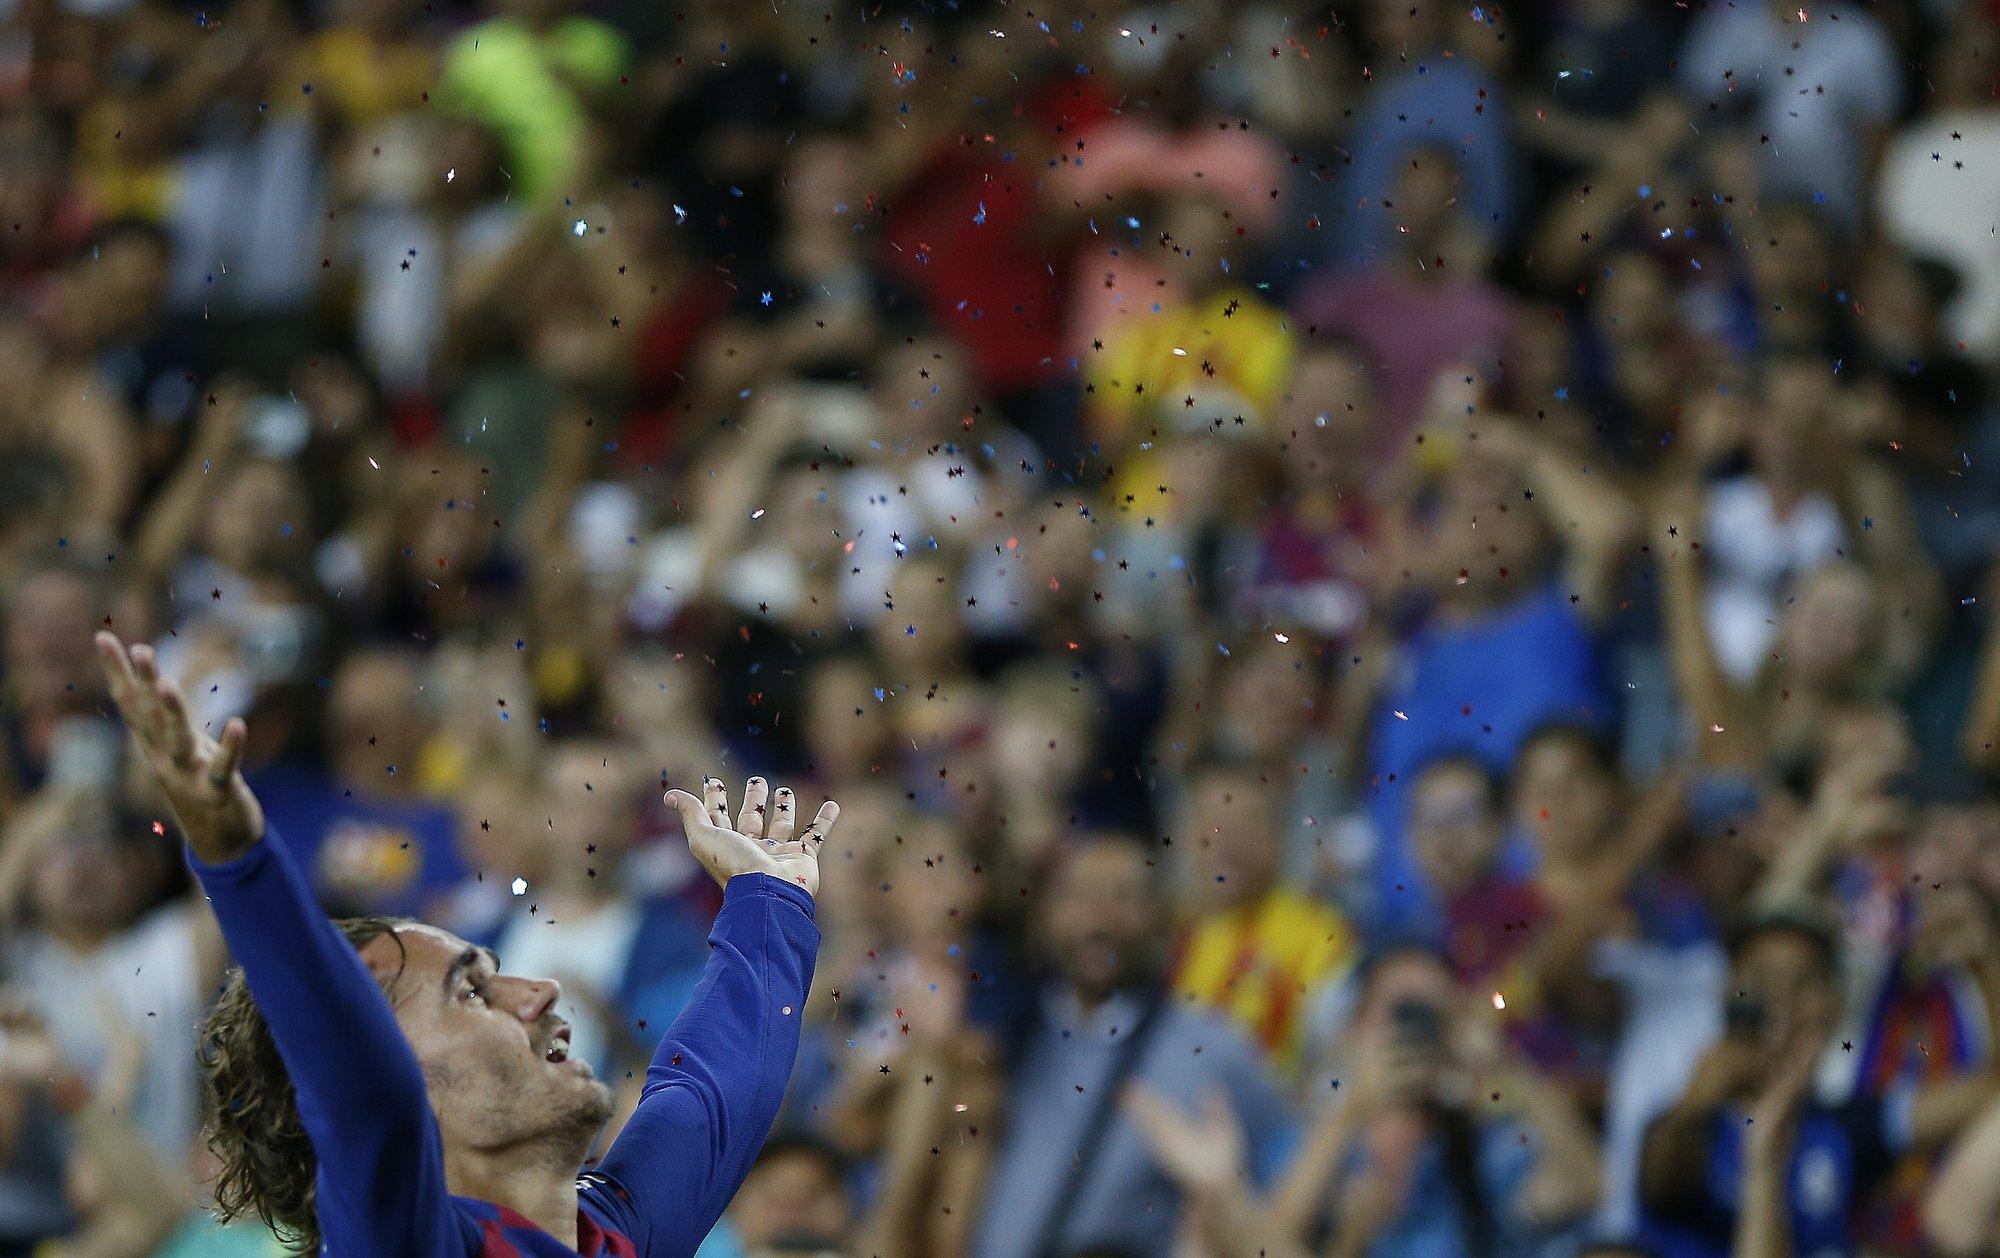 Messi, LeBron inspire Griezmann as Barcelona routs Betis 5-2